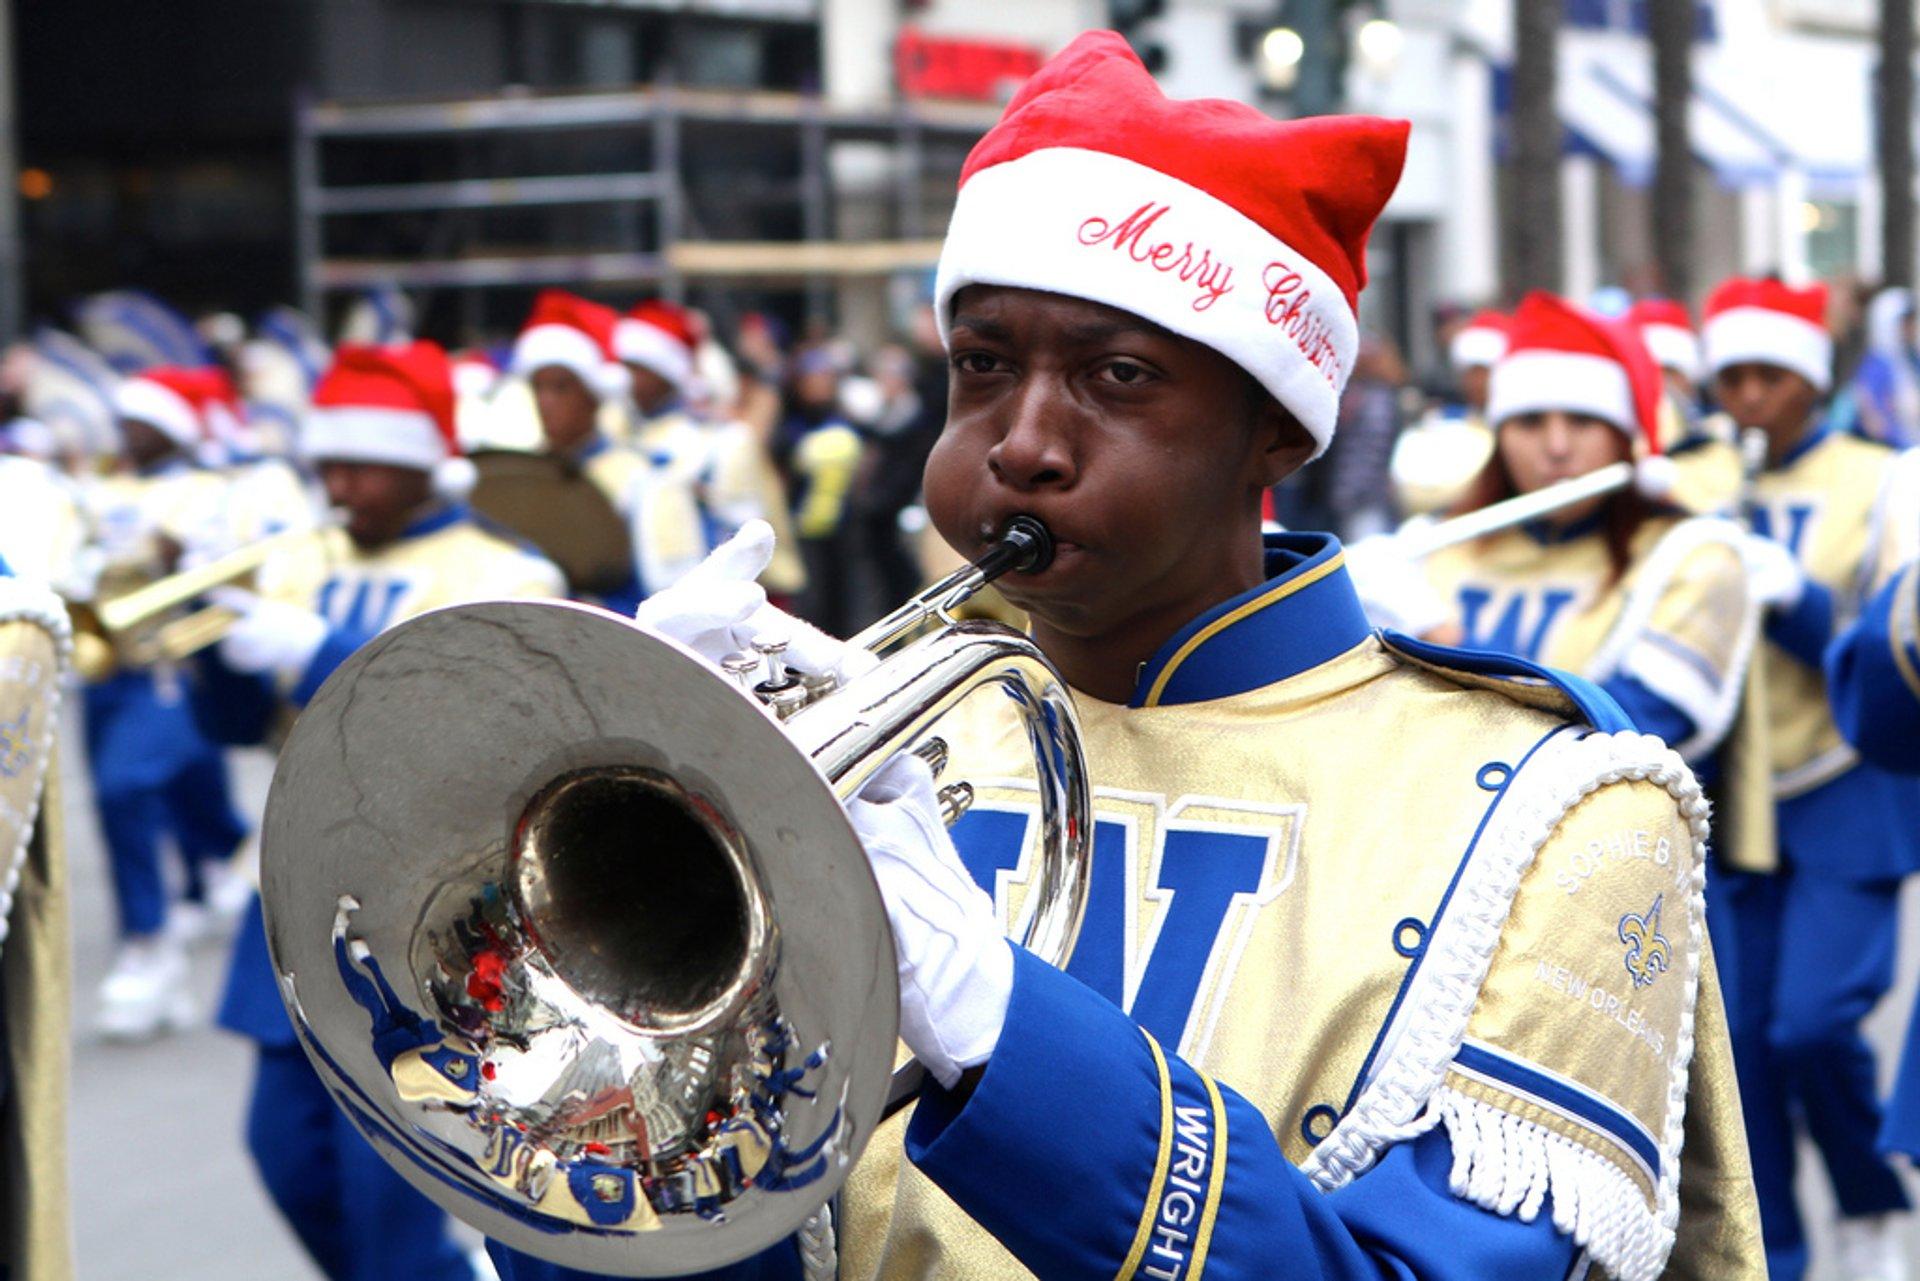 Krewe of Jingle Parade in New Orleans - Best Season 2019